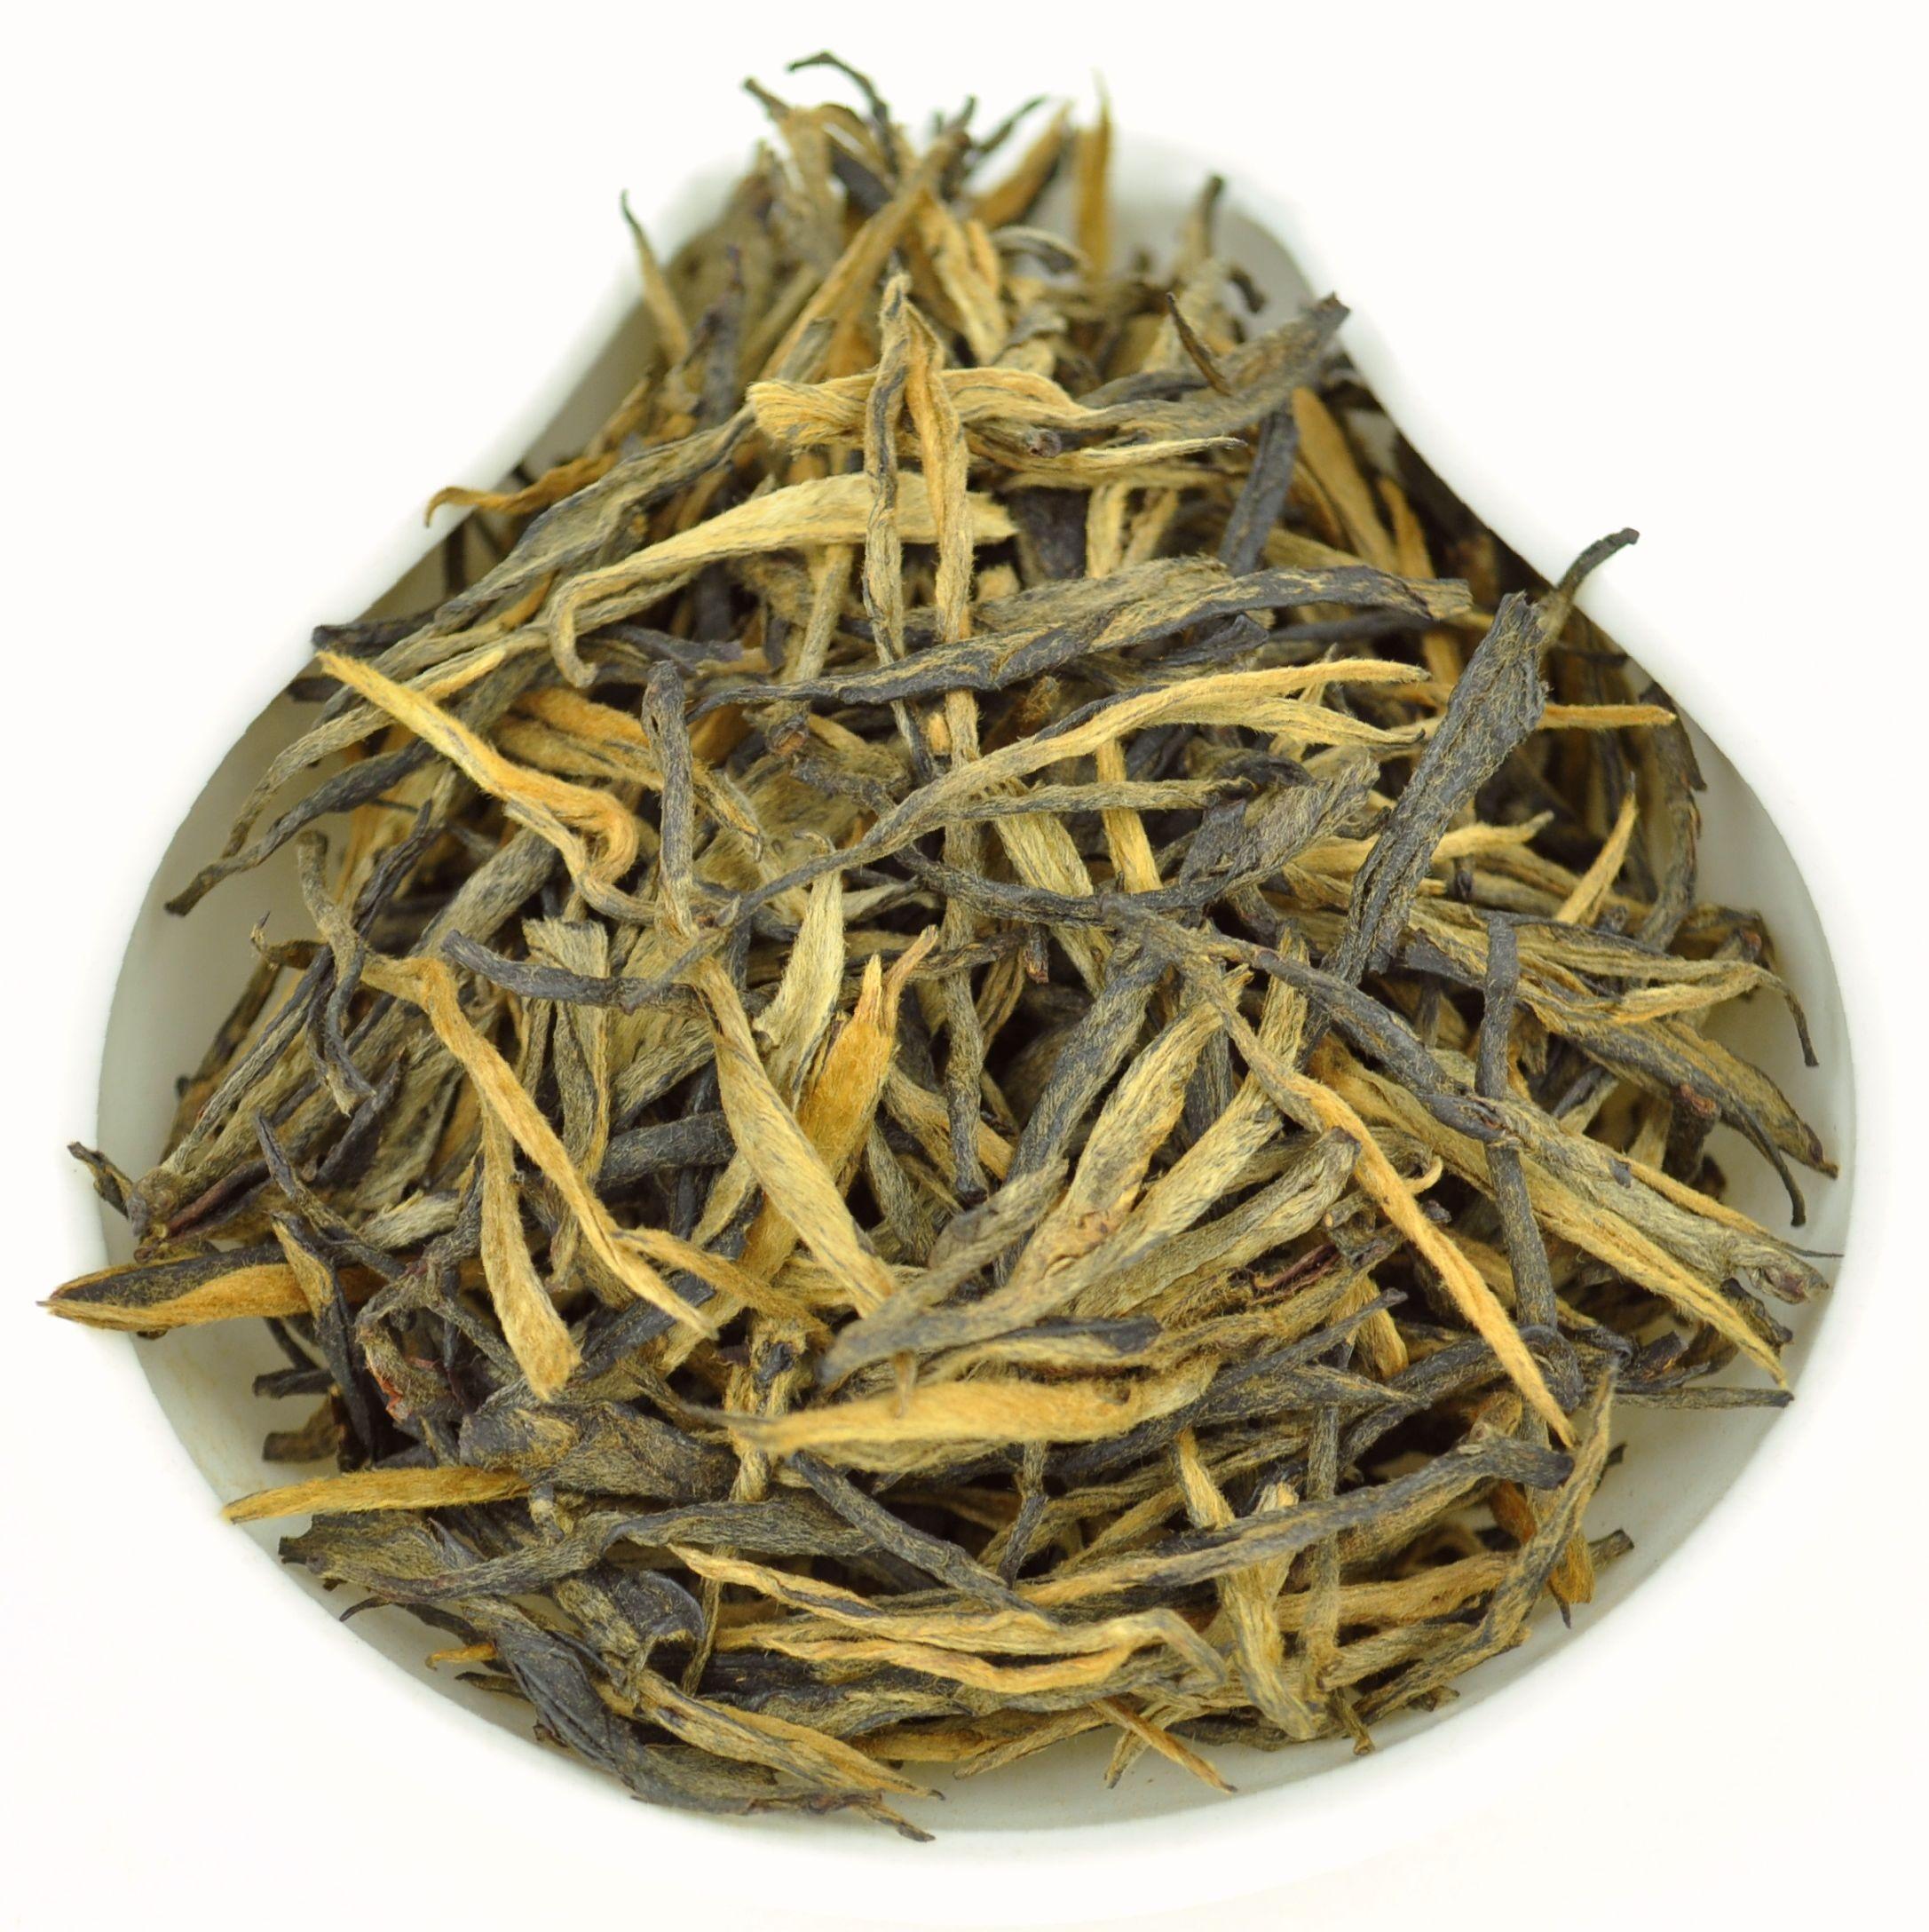 Feng Qing Classic 58 Dian Hong Premium Yunnan Black tea * Spring 2016